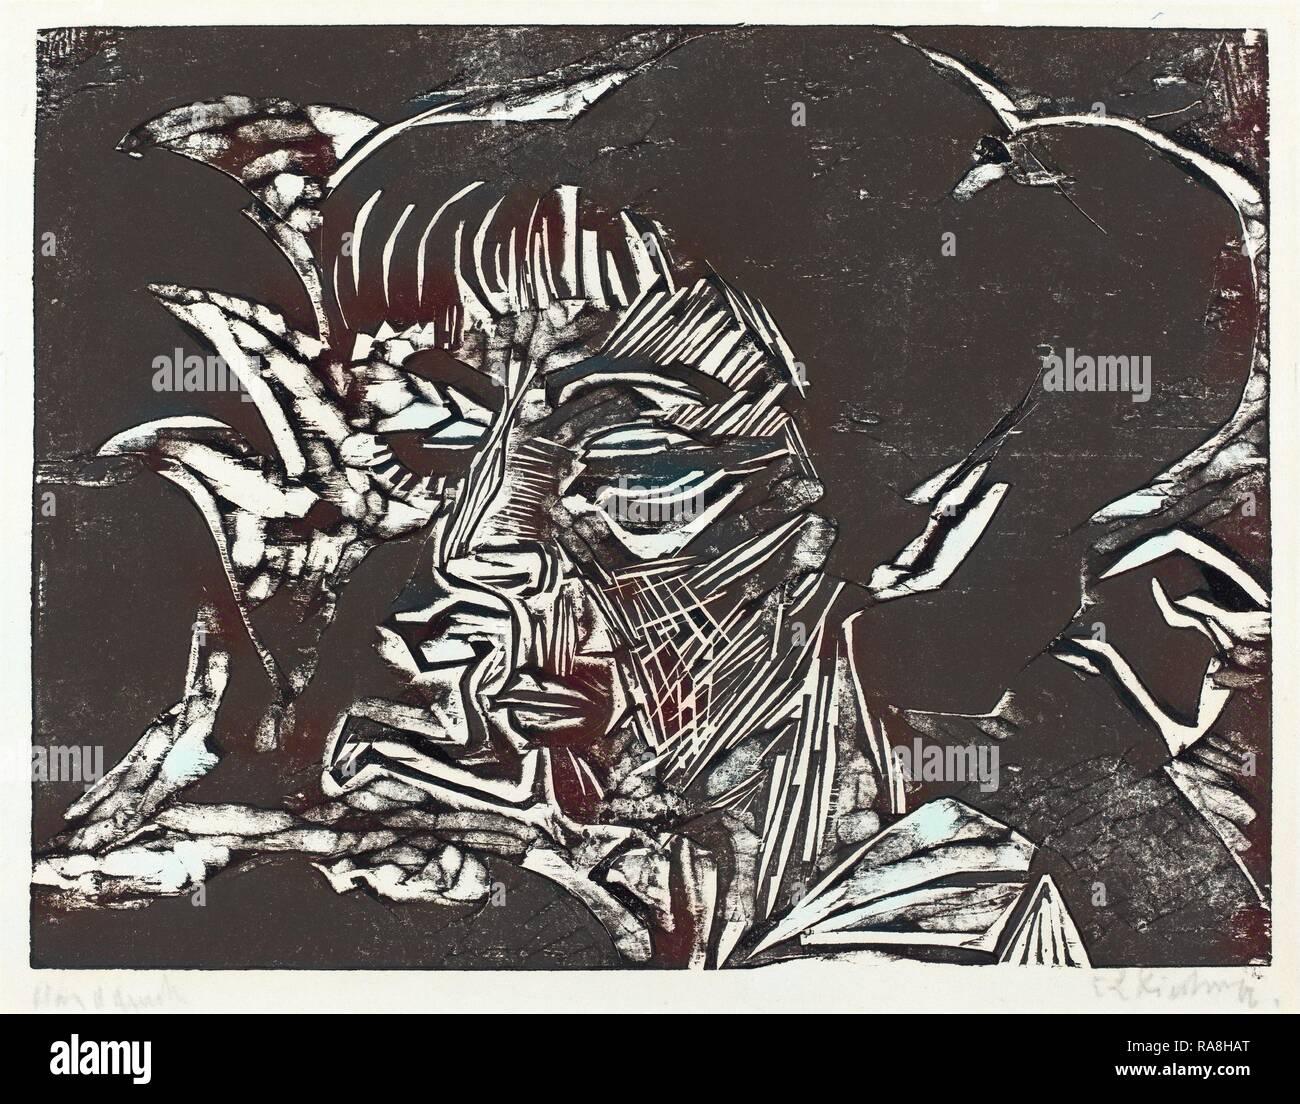 Ernst Ludwig Kirchner, Fanny Wocke, German, 1880 - 1938, 1916, woodcut in black on blotting paper. Reimagined - Stock Image